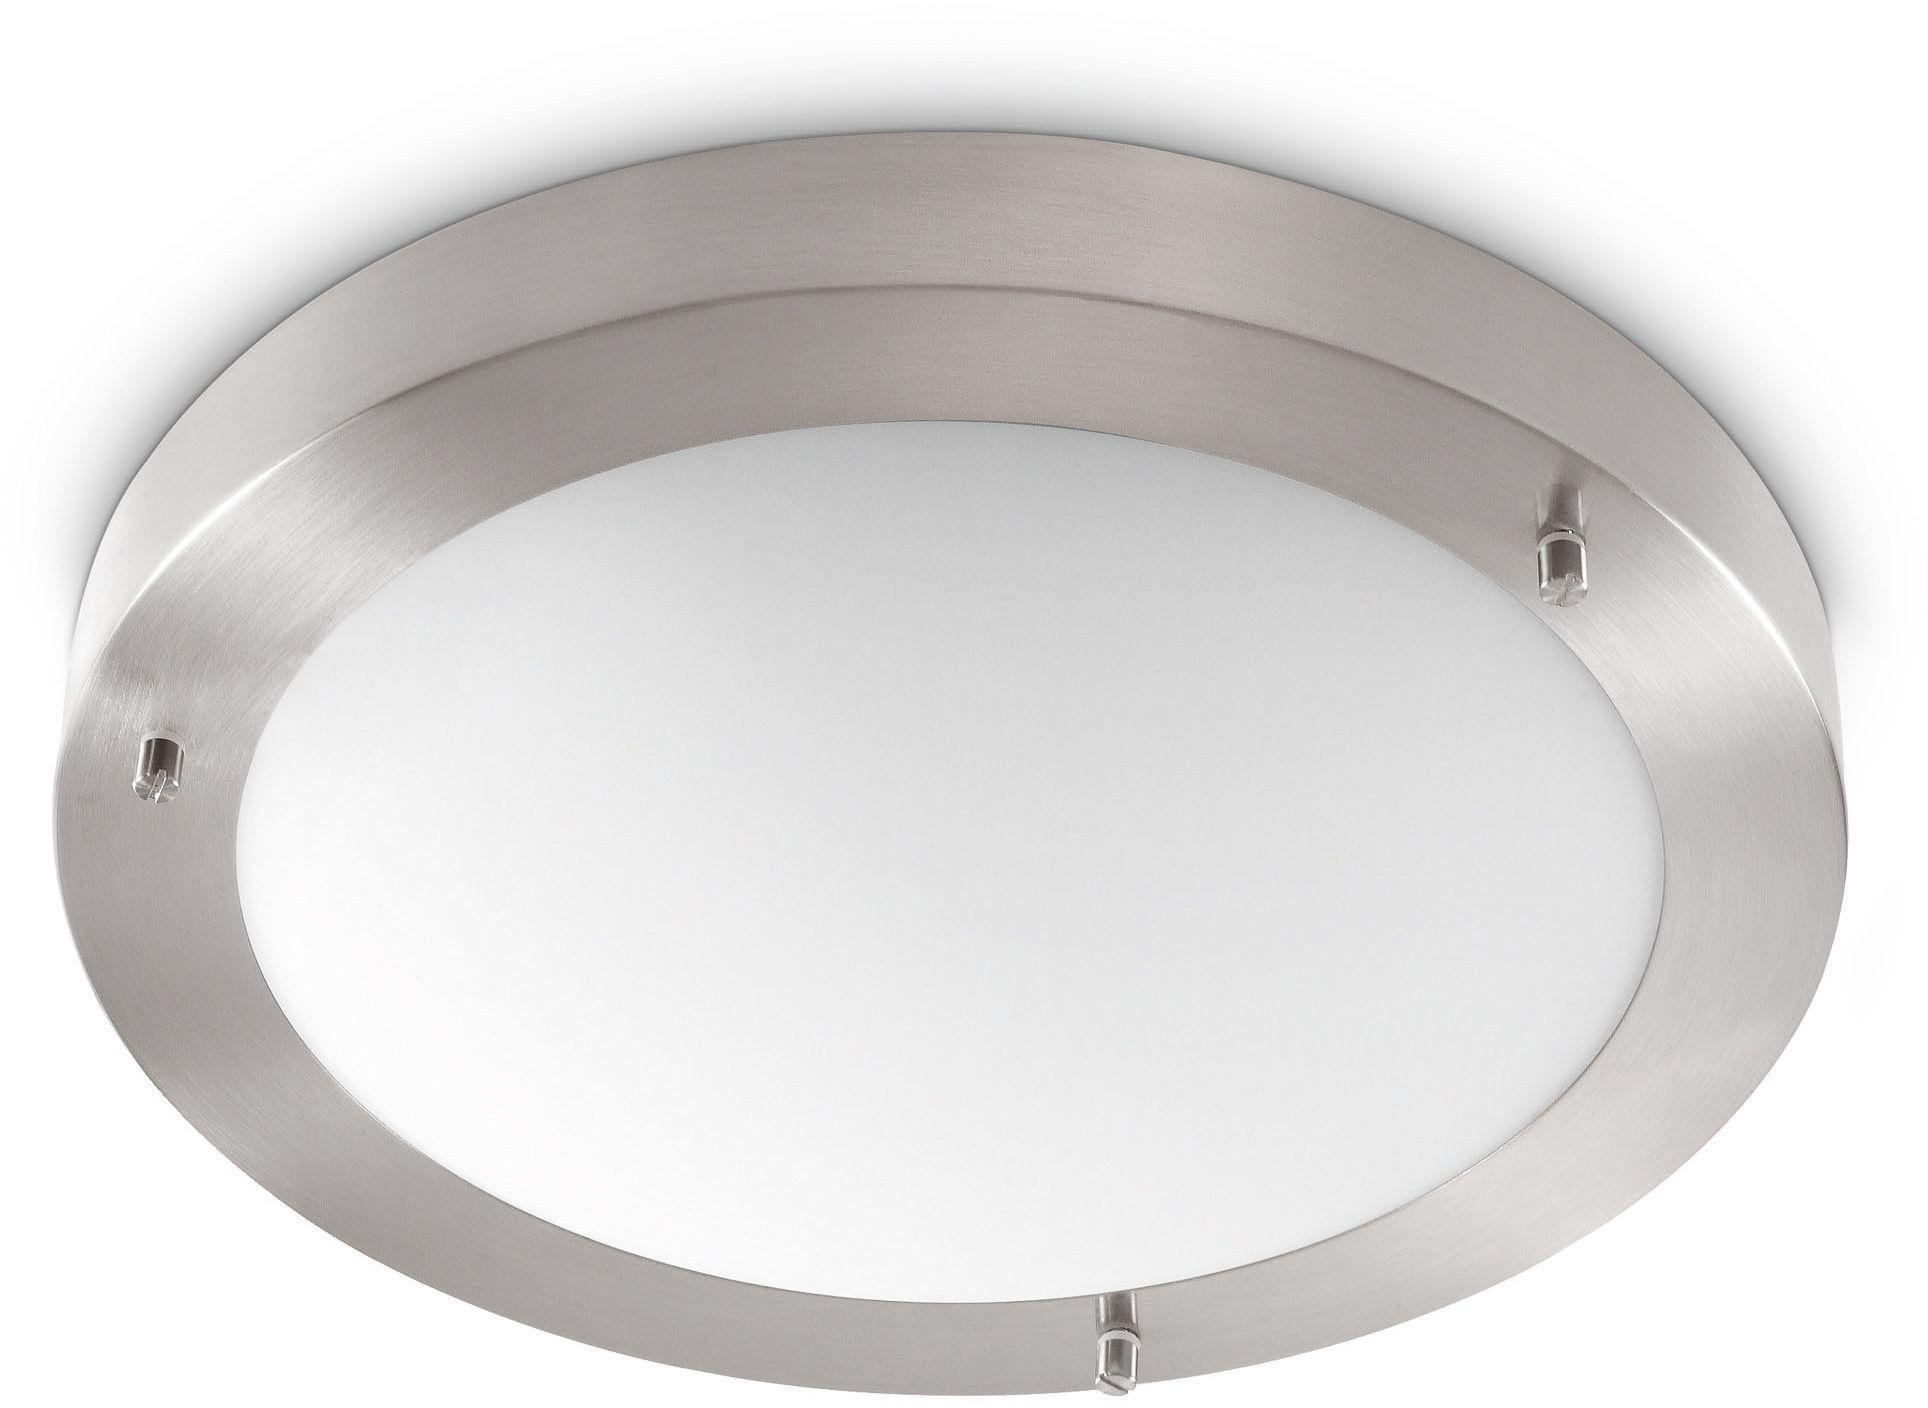 Philips myBathroom Salts Ceiling Light - Matt Chrome.